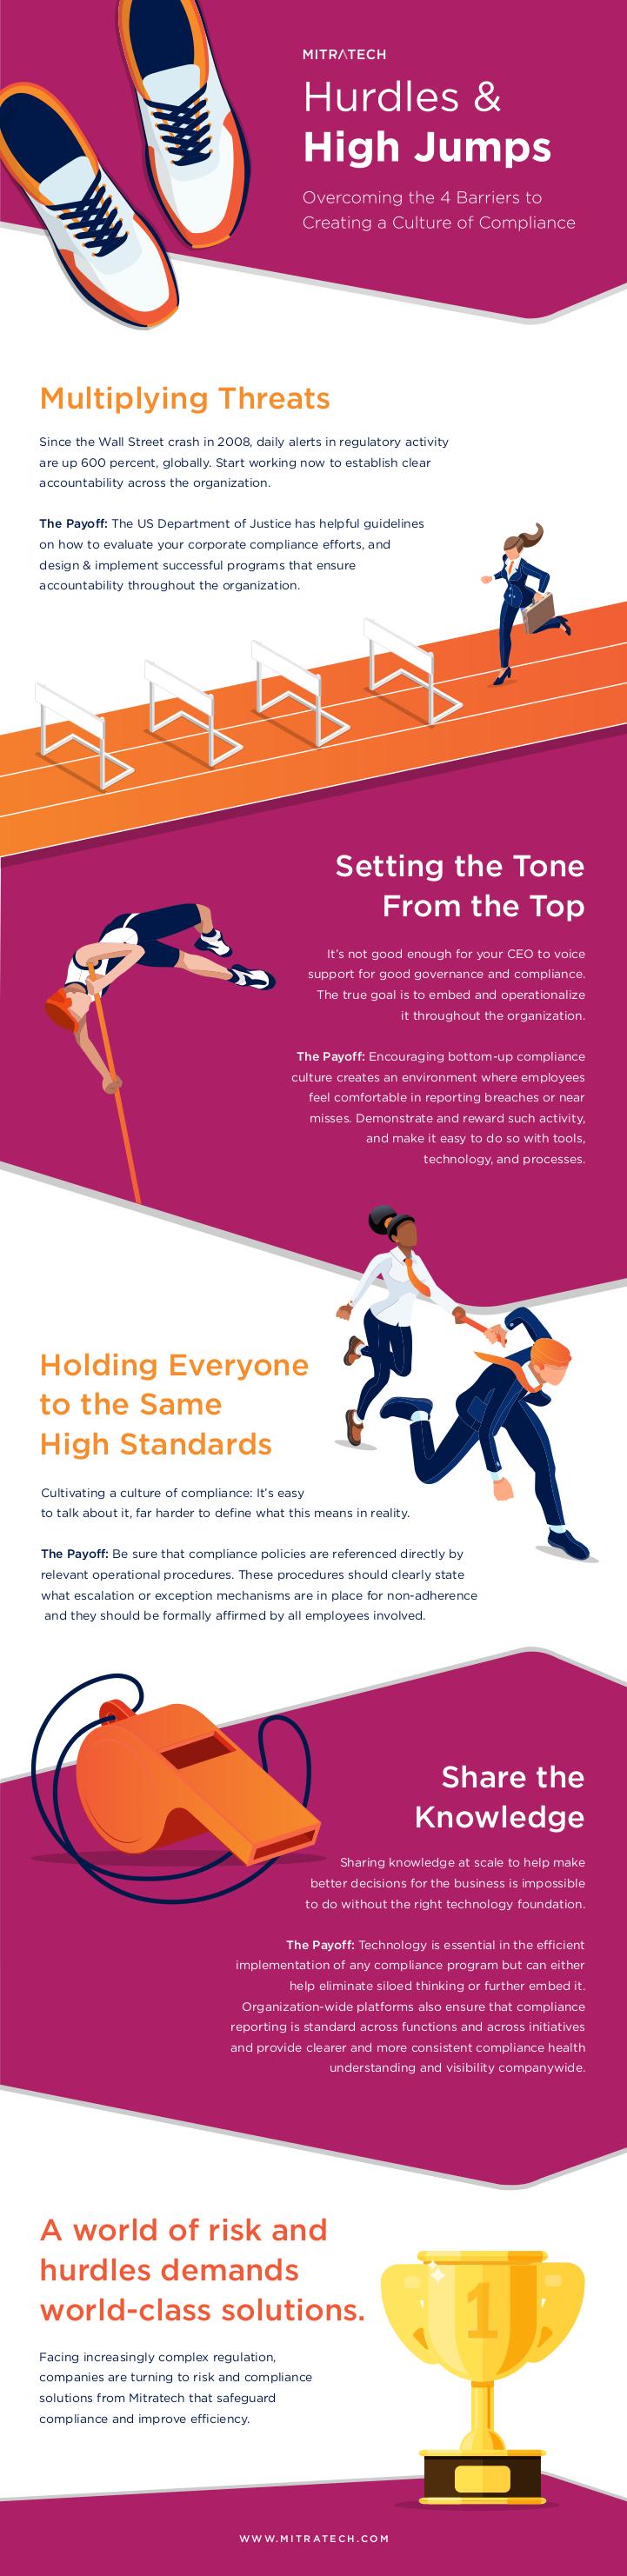 GRC Compliance Hurdles Infographic